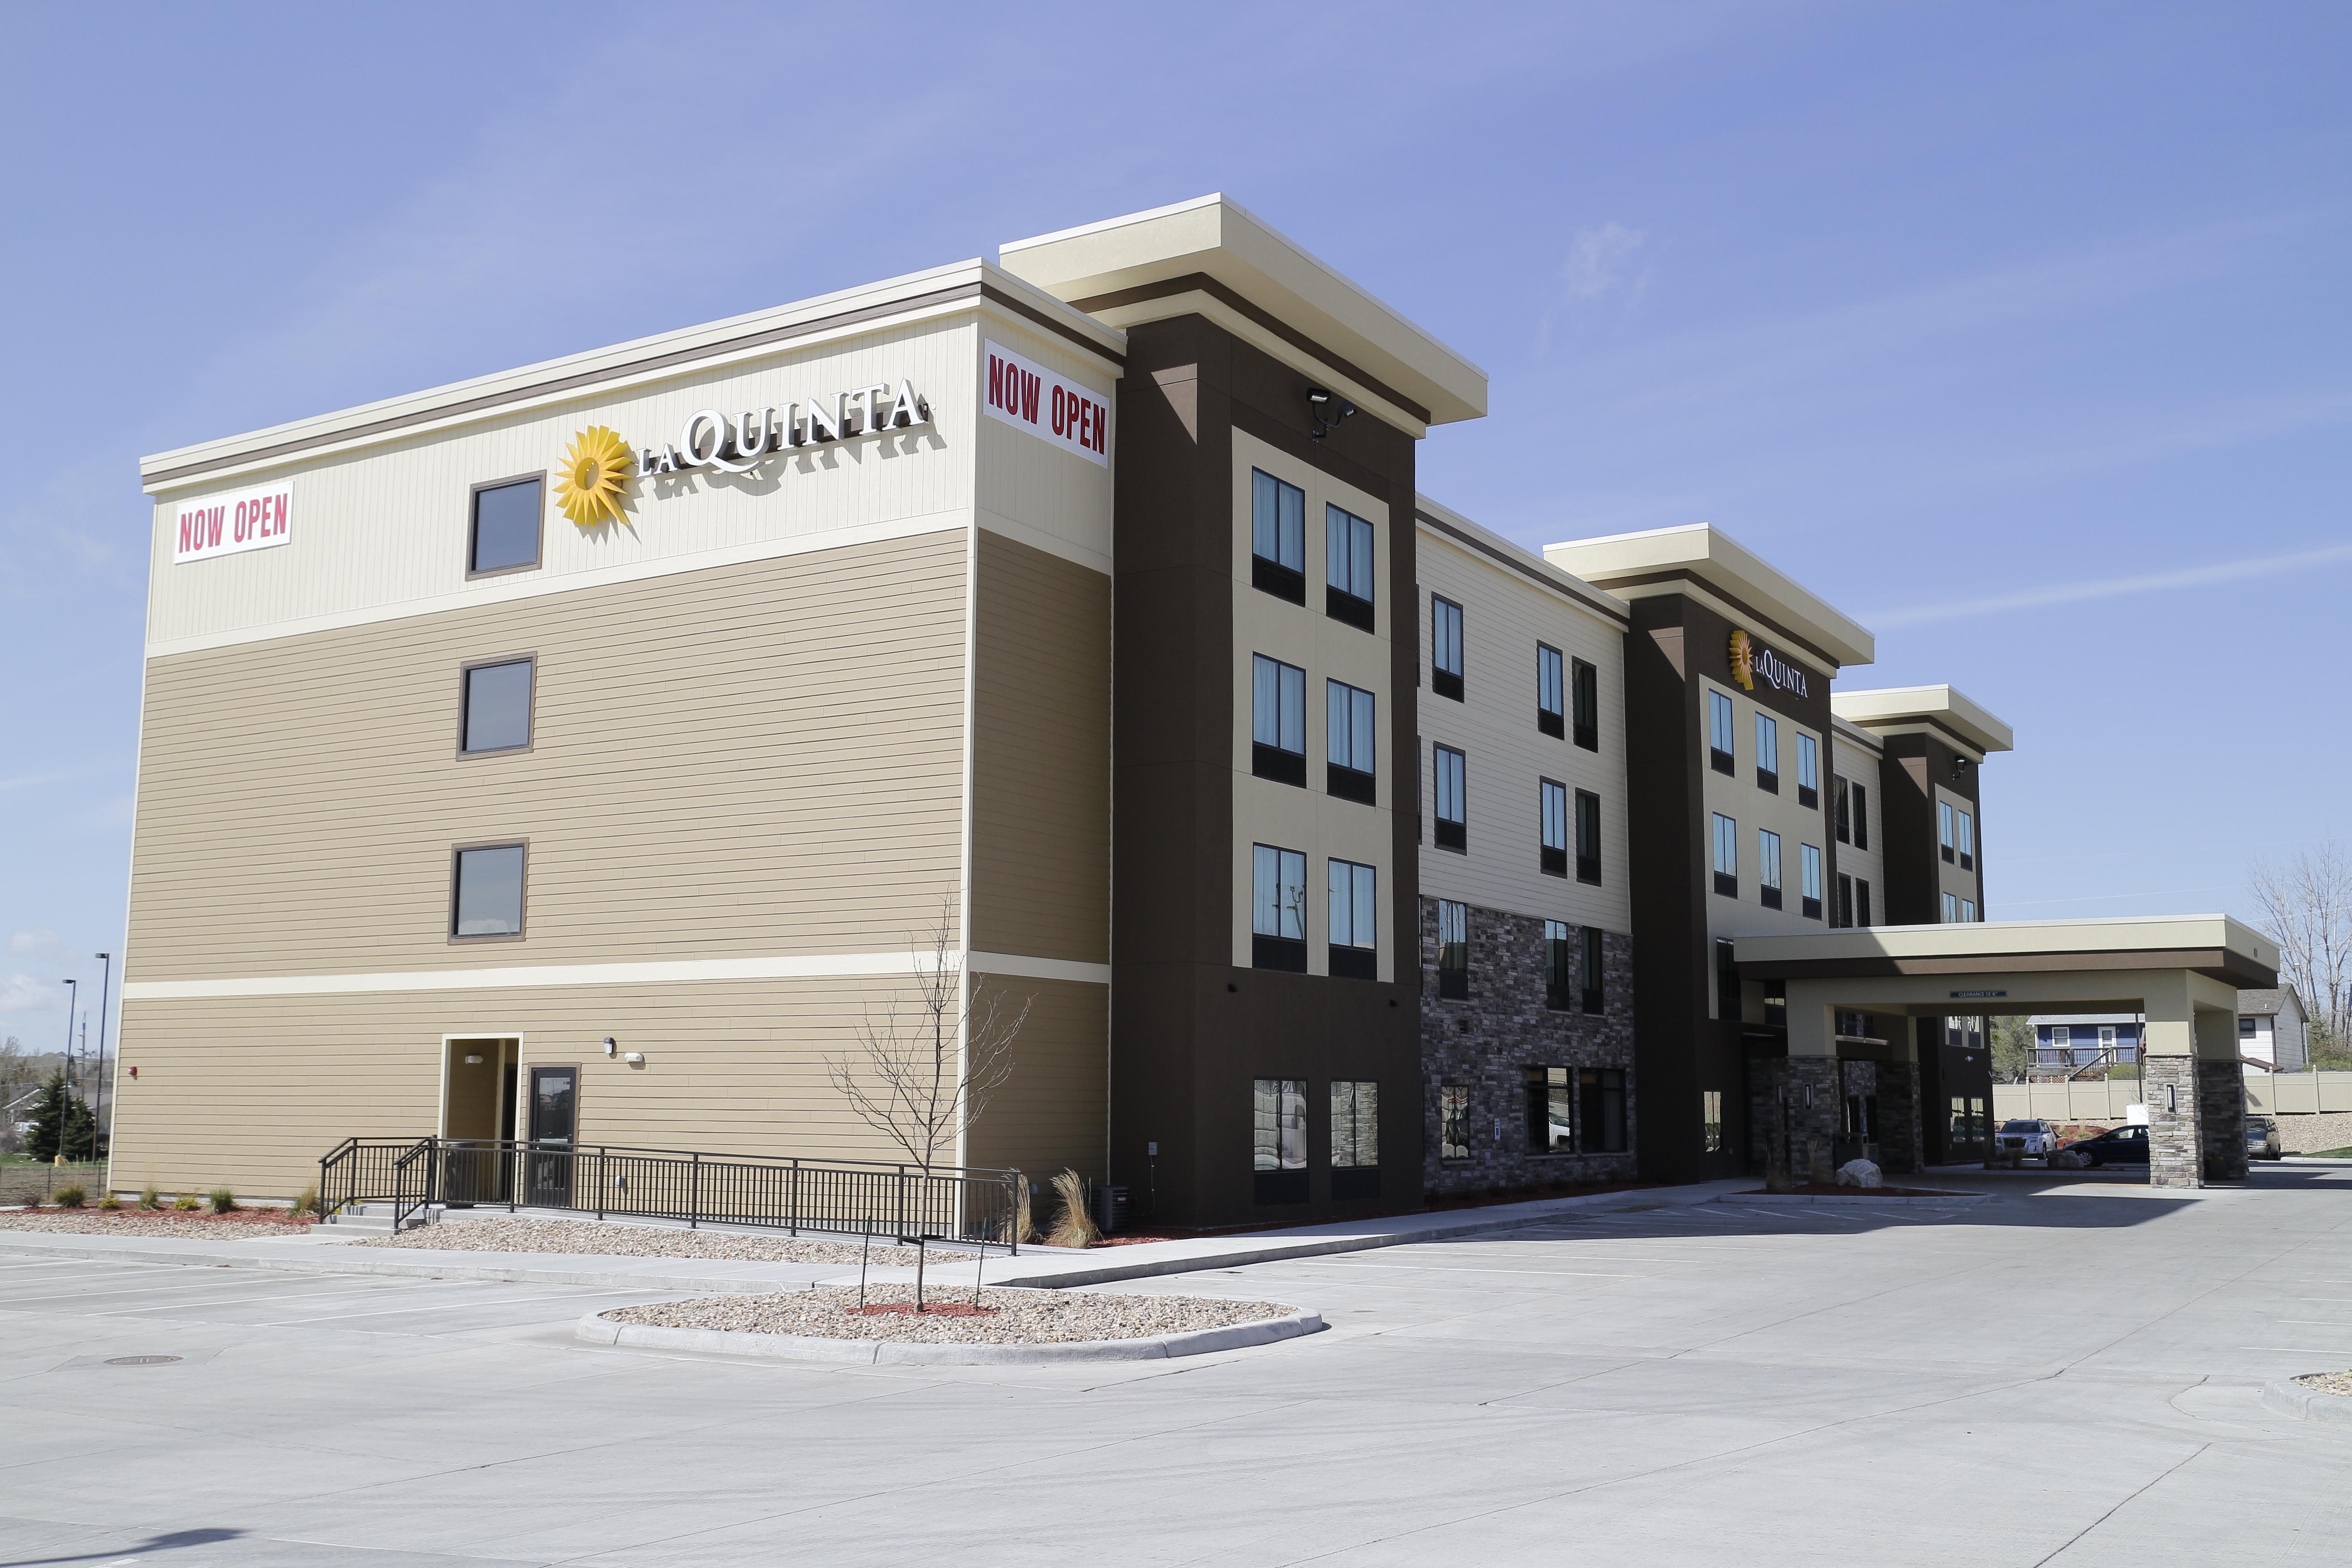 Days Inn Hotel And Suites Niagara Falls